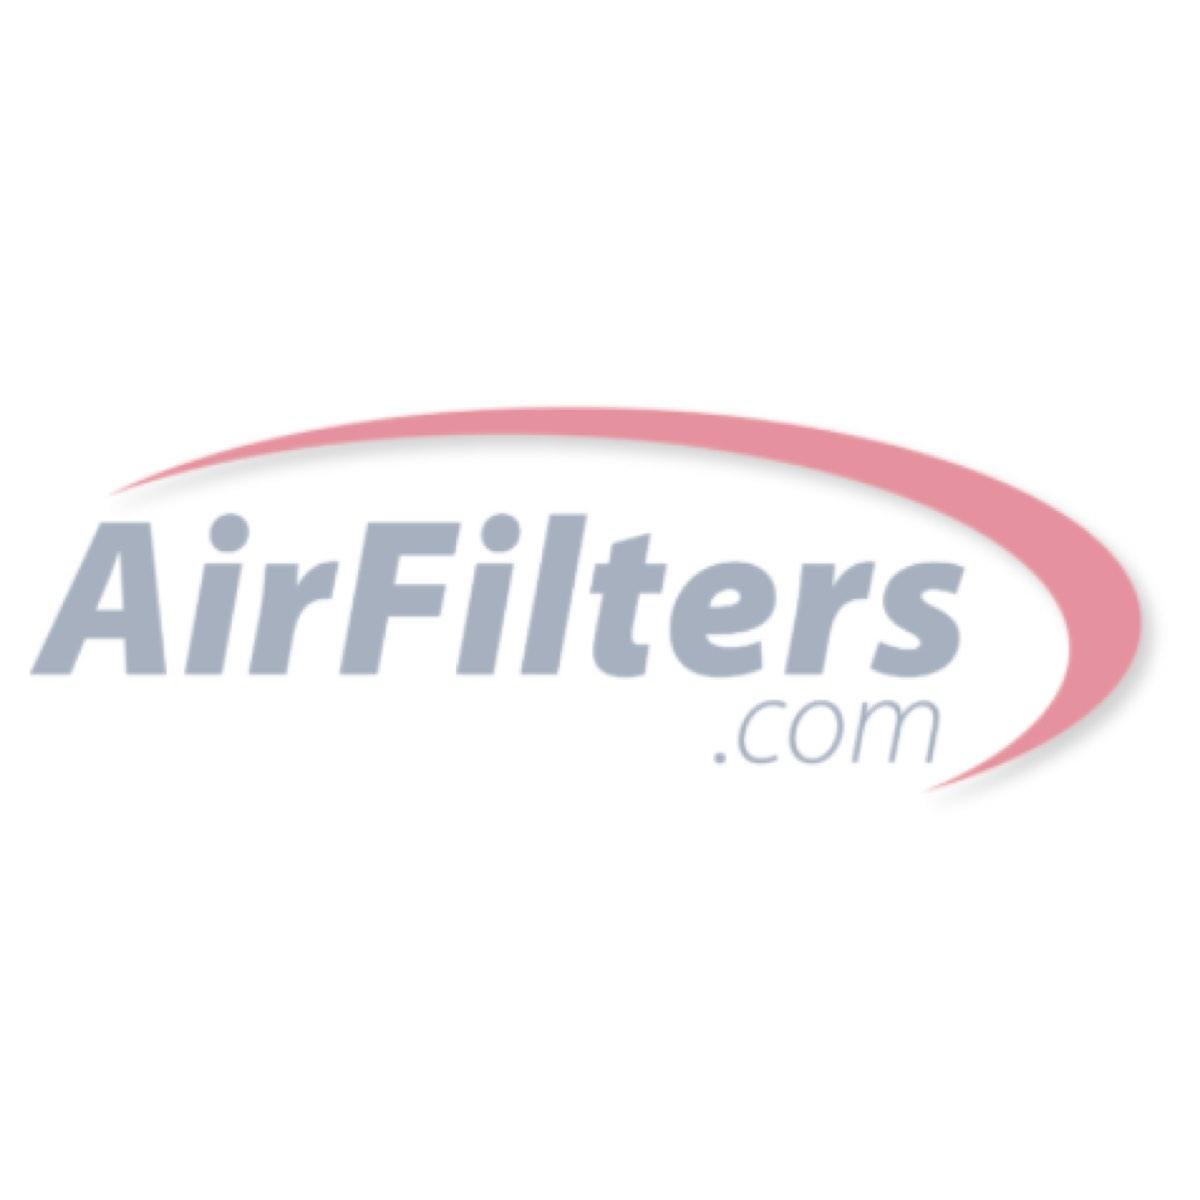 20x25x4.5 Bryant® EZ Flex Filters by Accumulair®